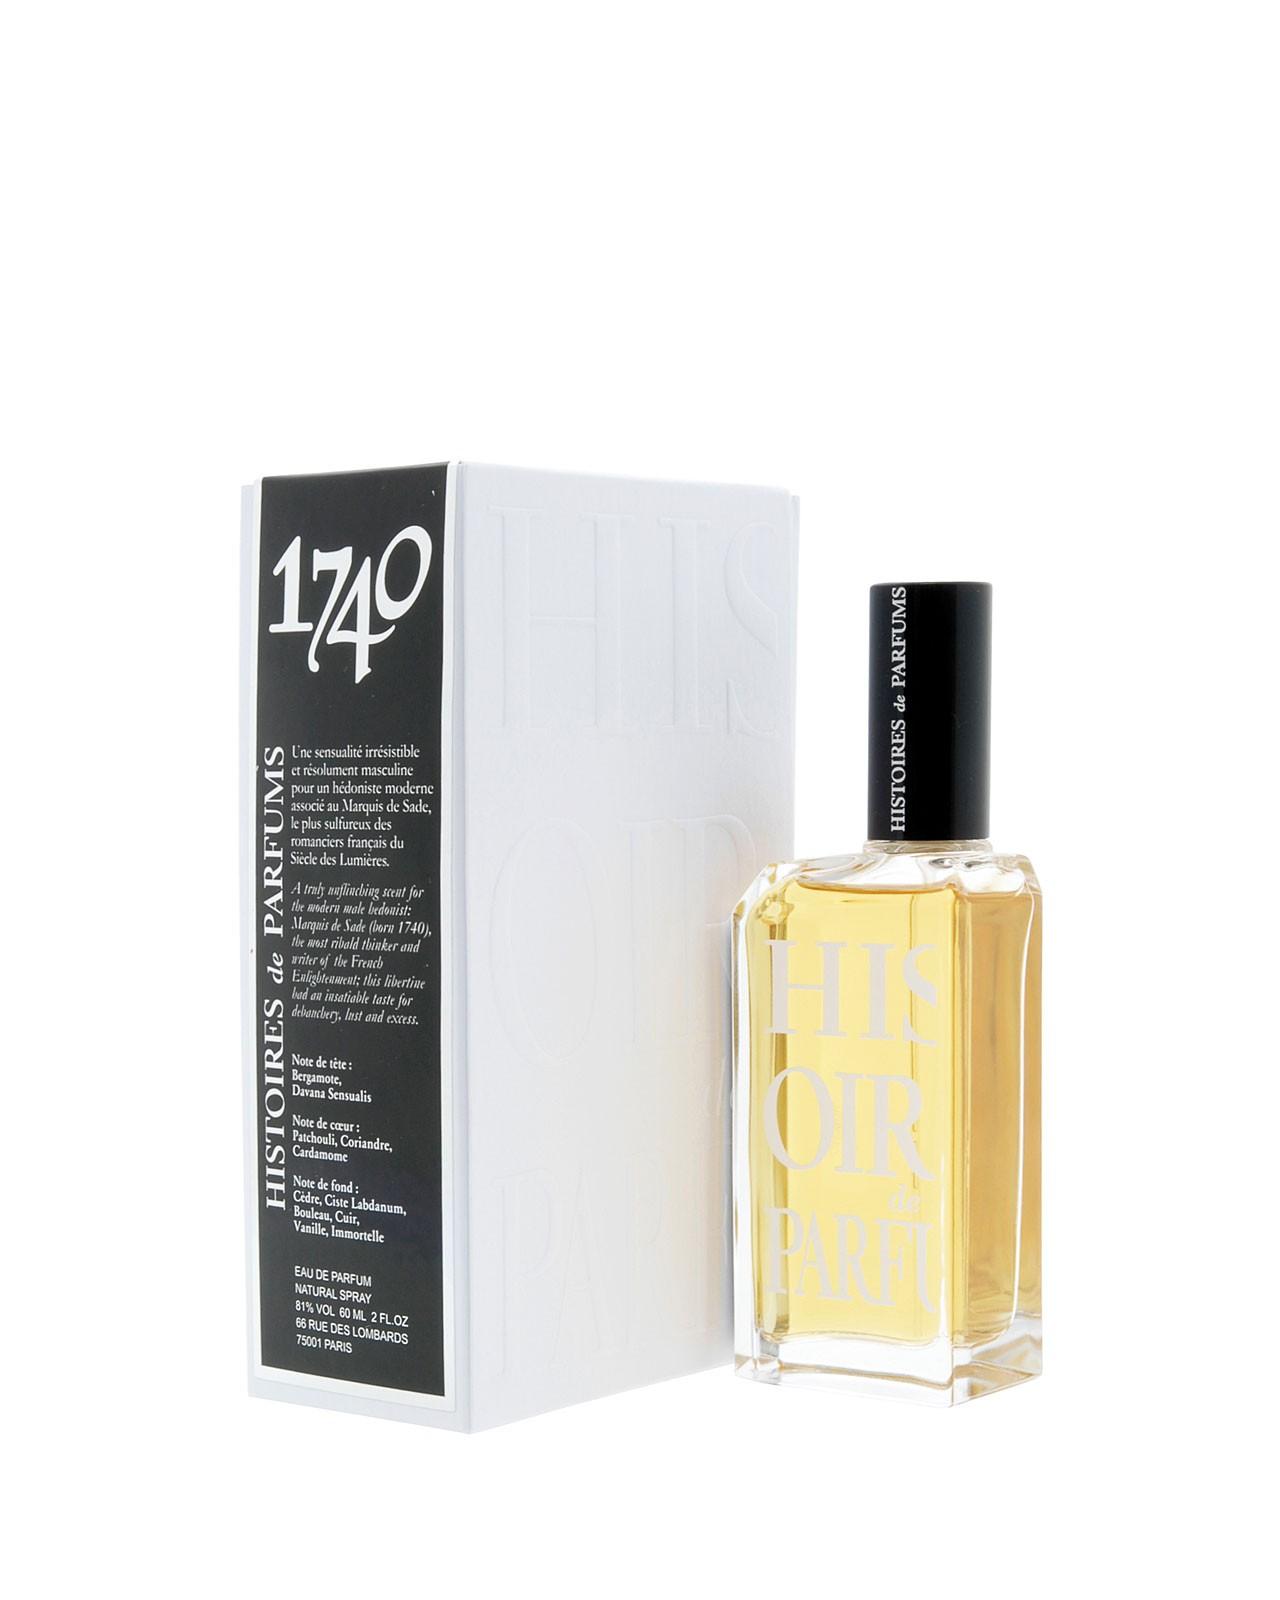 Histoires de Parfums 1740 Marquis de Sade аромат для мужчин